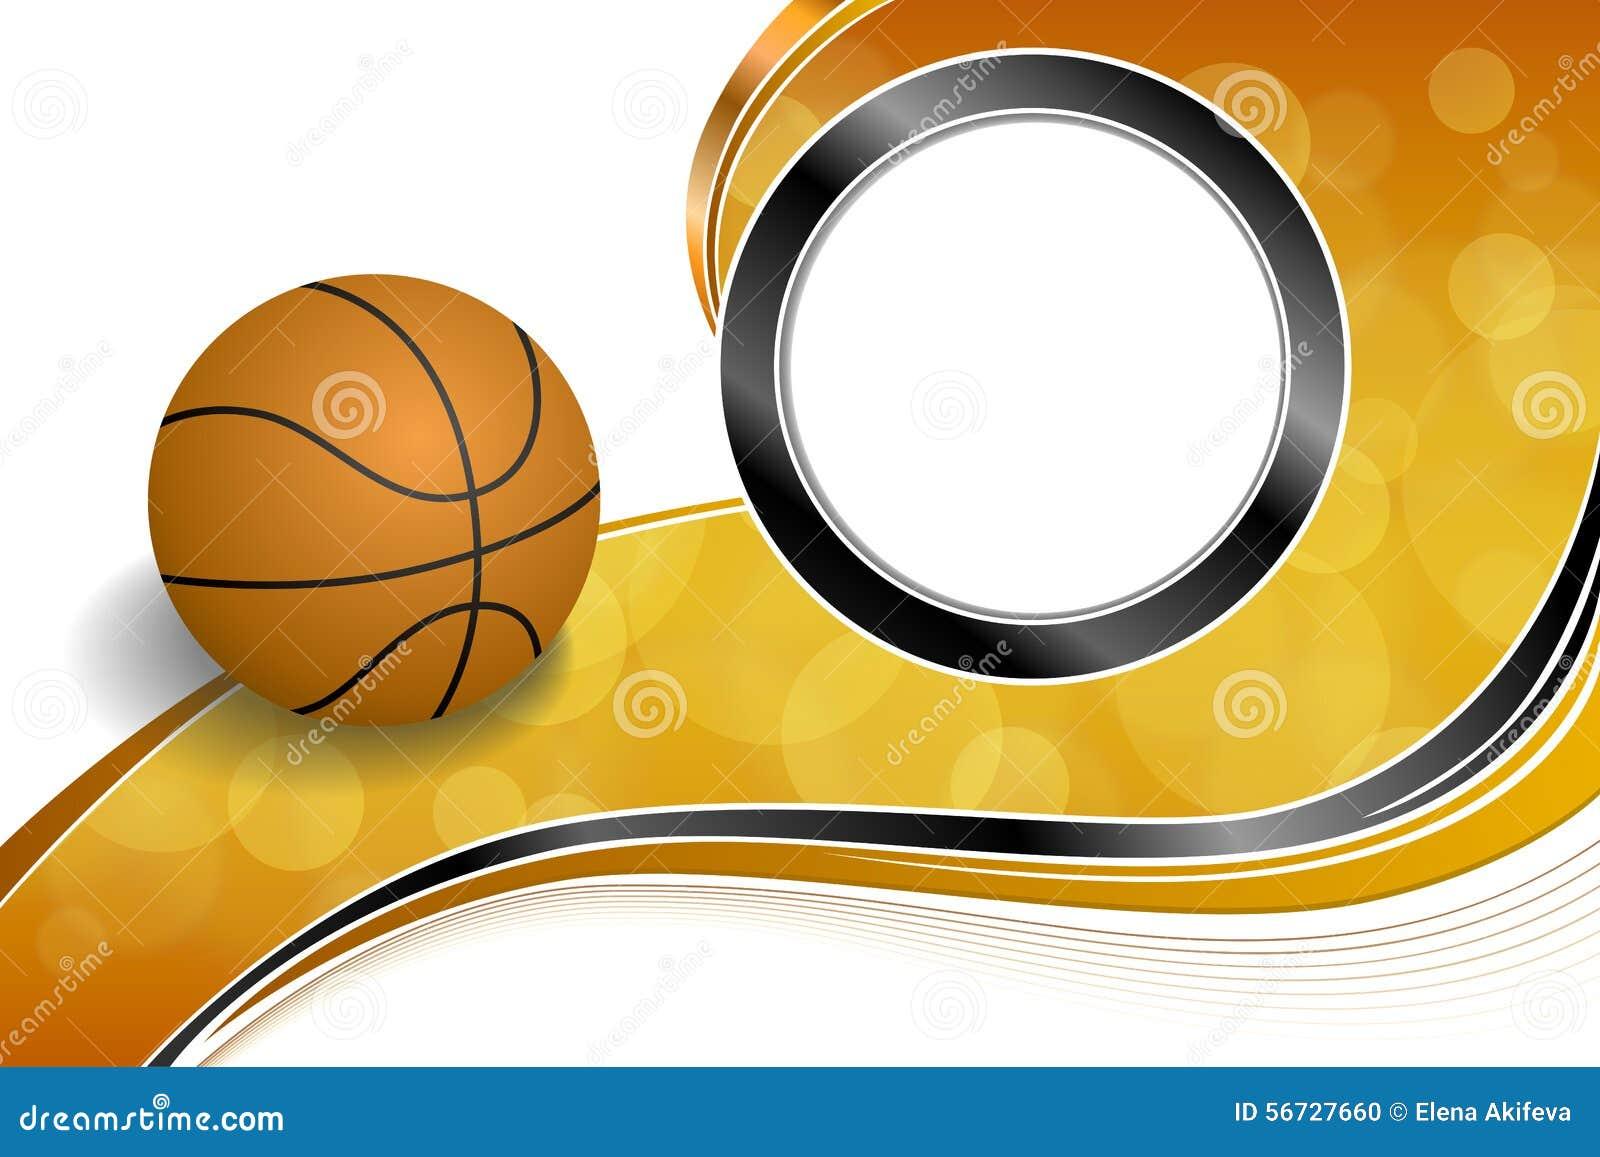 Perfecto Marcos De Cuadros De Baloncesto Ornamento - Ideas ...